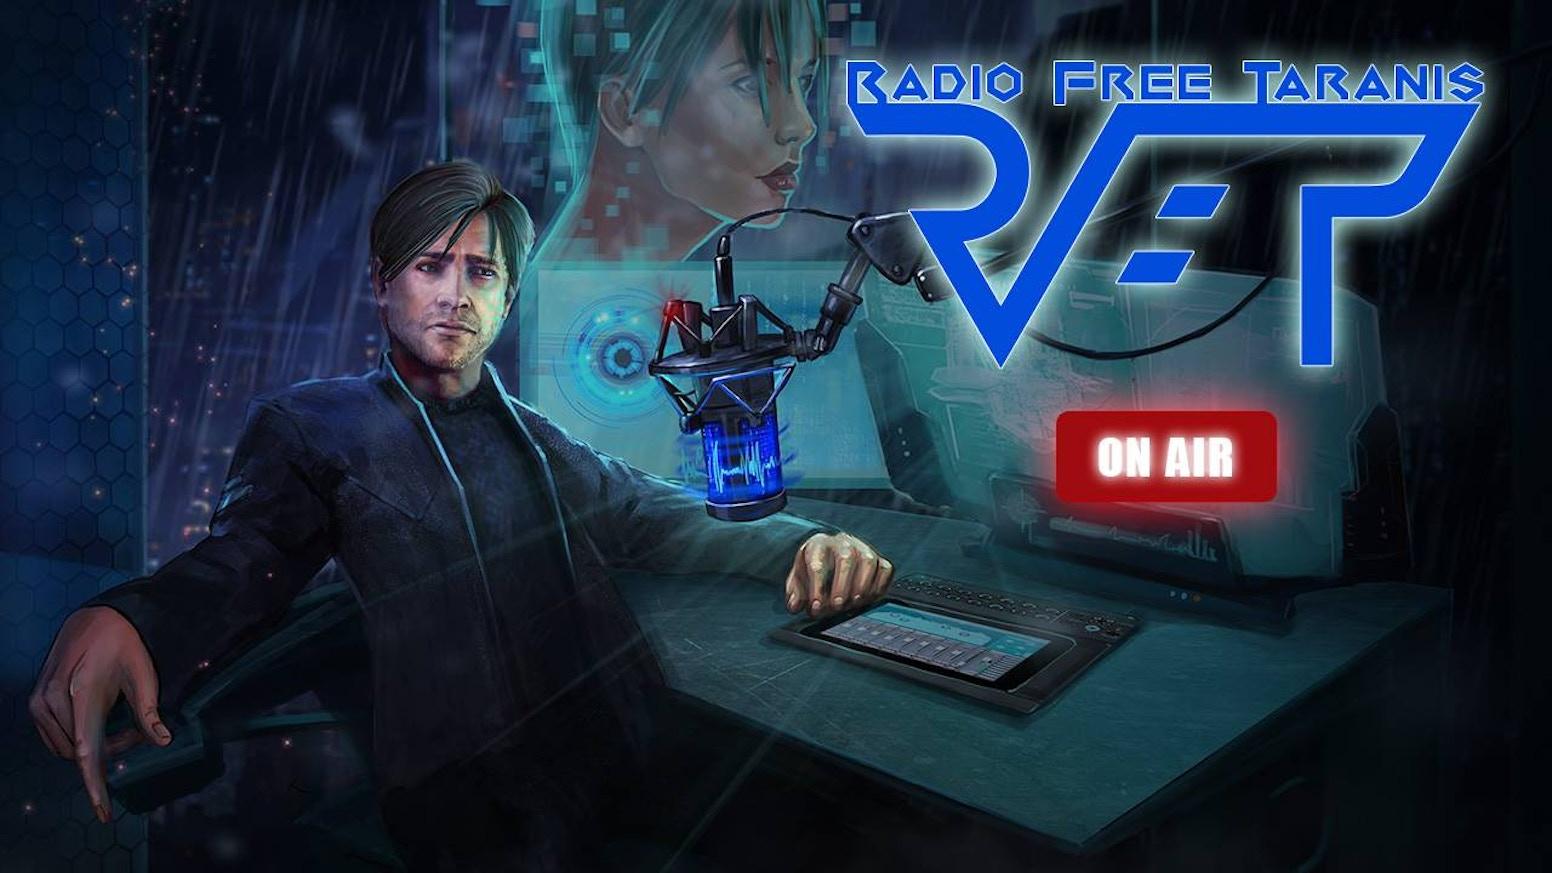 Radio Free Taranis - A Full-Cast Sci-Fi Audio Drama by Shades of